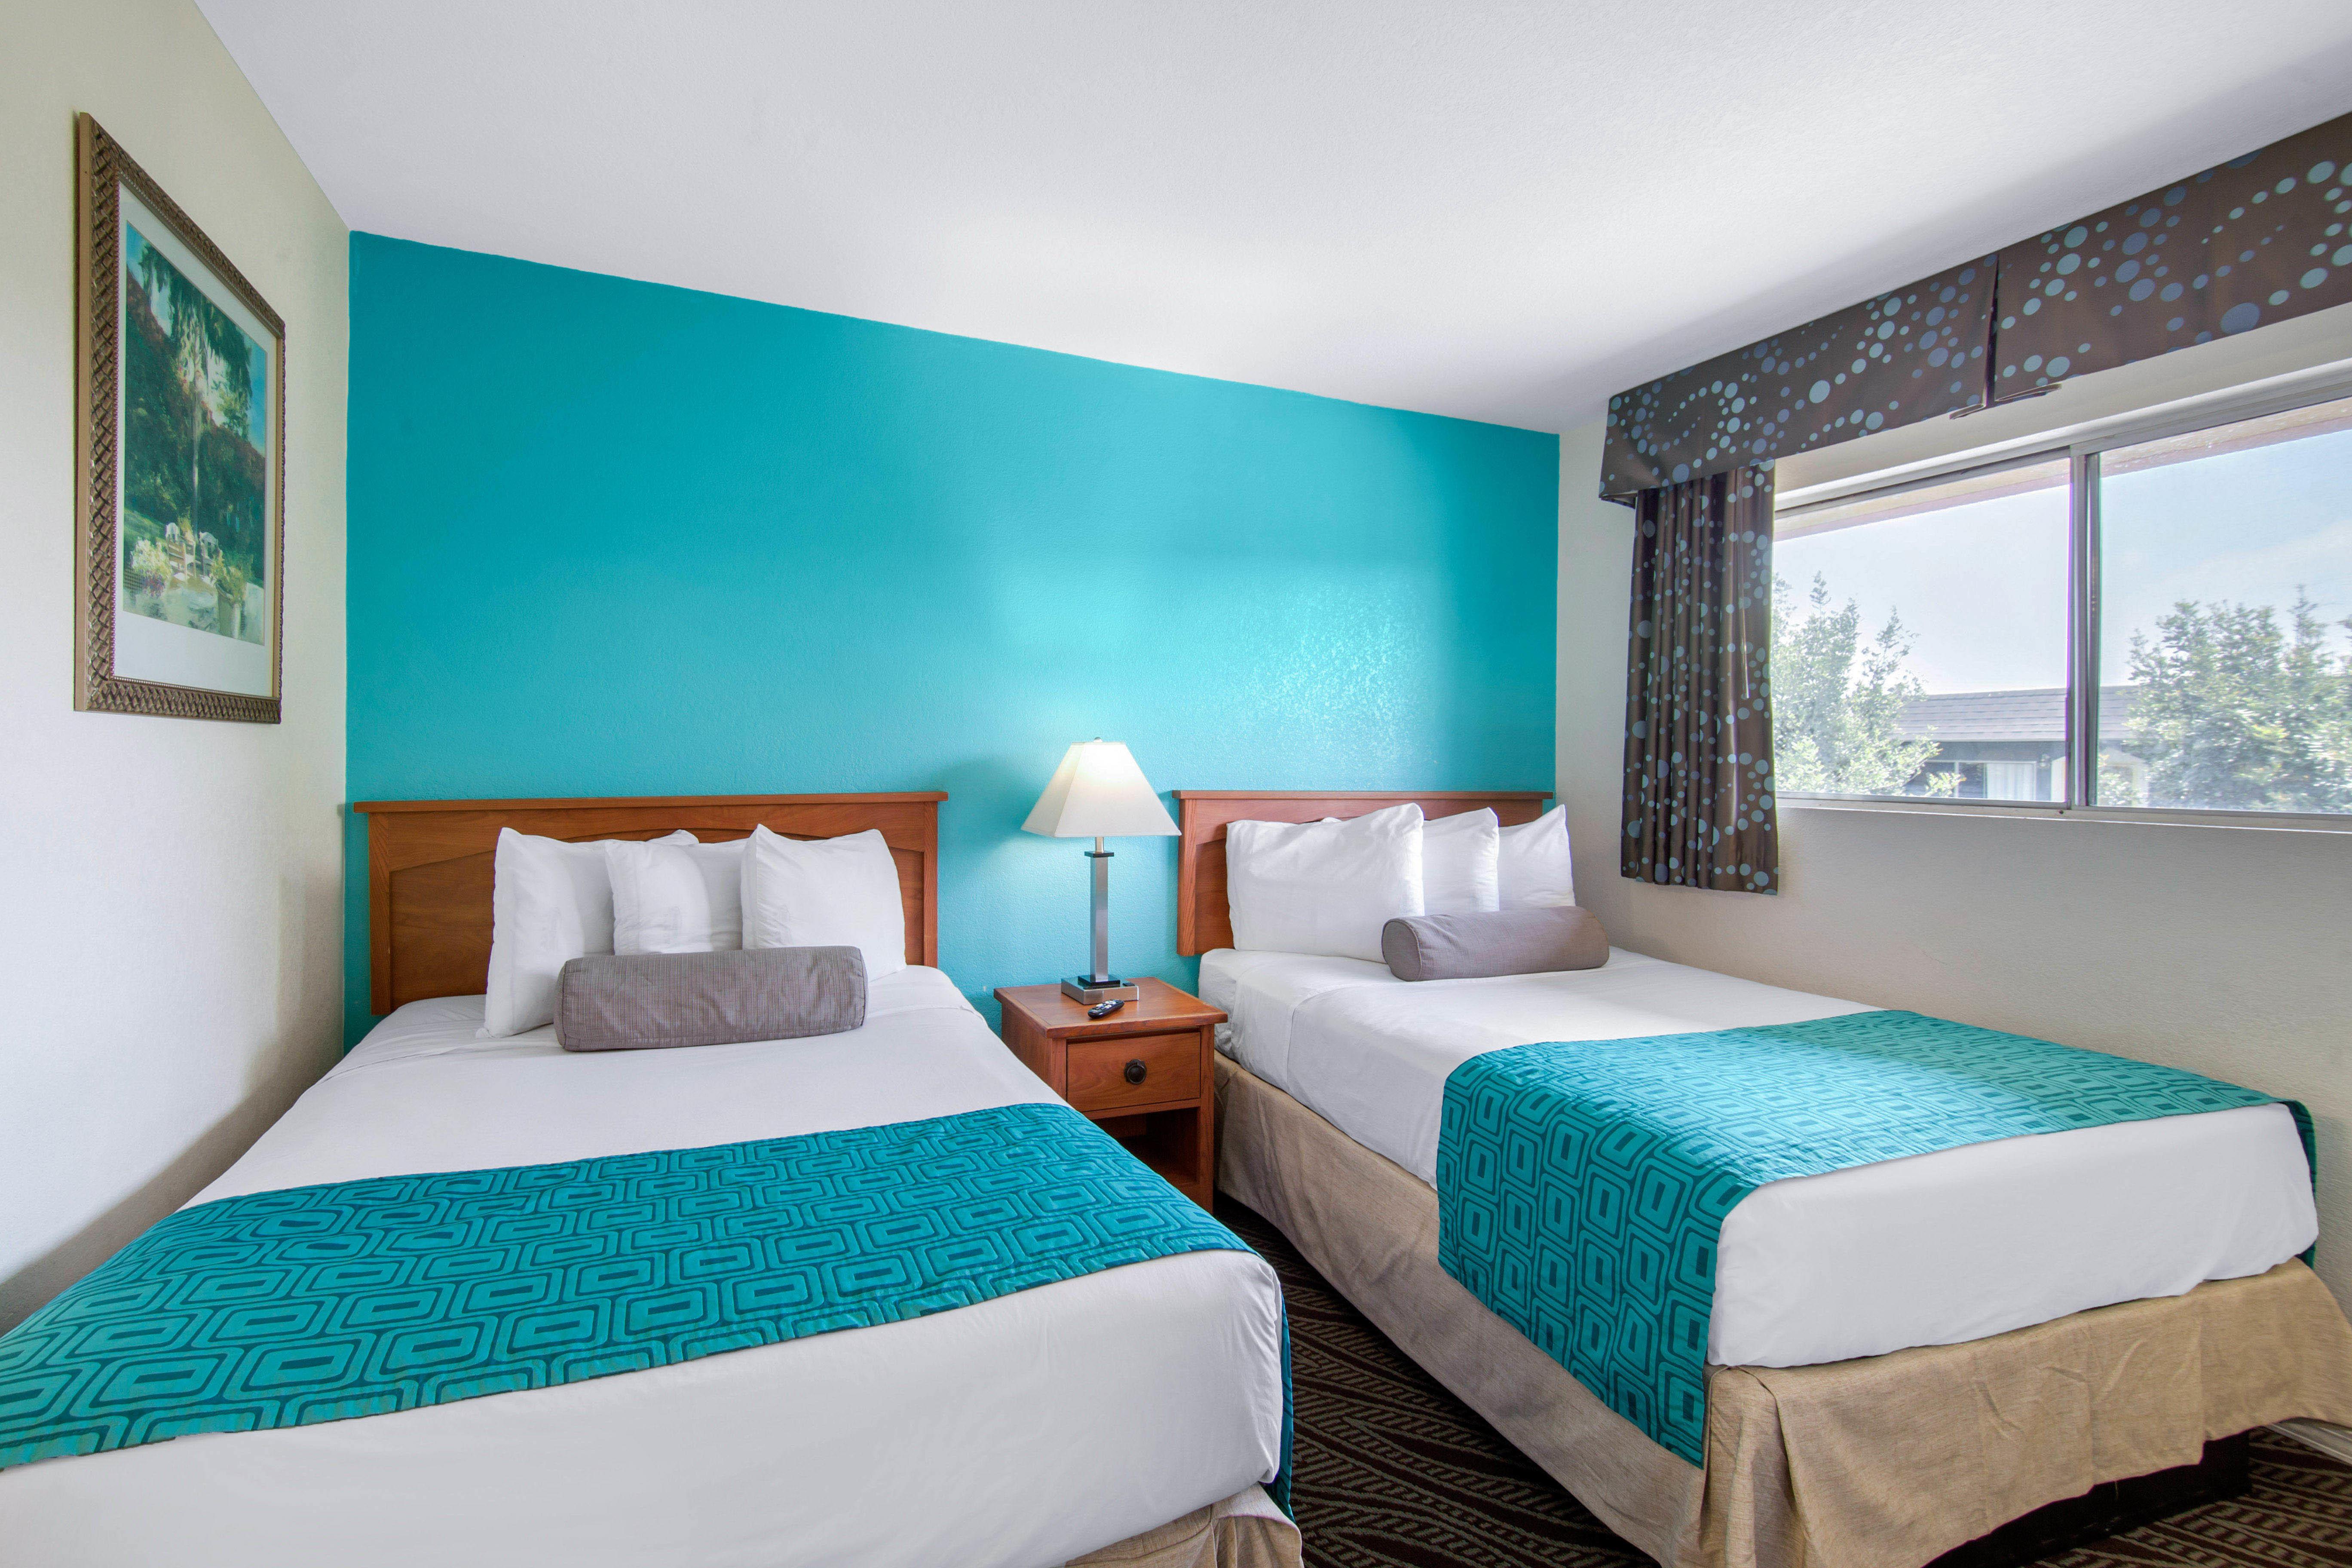 Howard Johnson by Wyndham Chula Vista San Diego Suite Hotel image 15